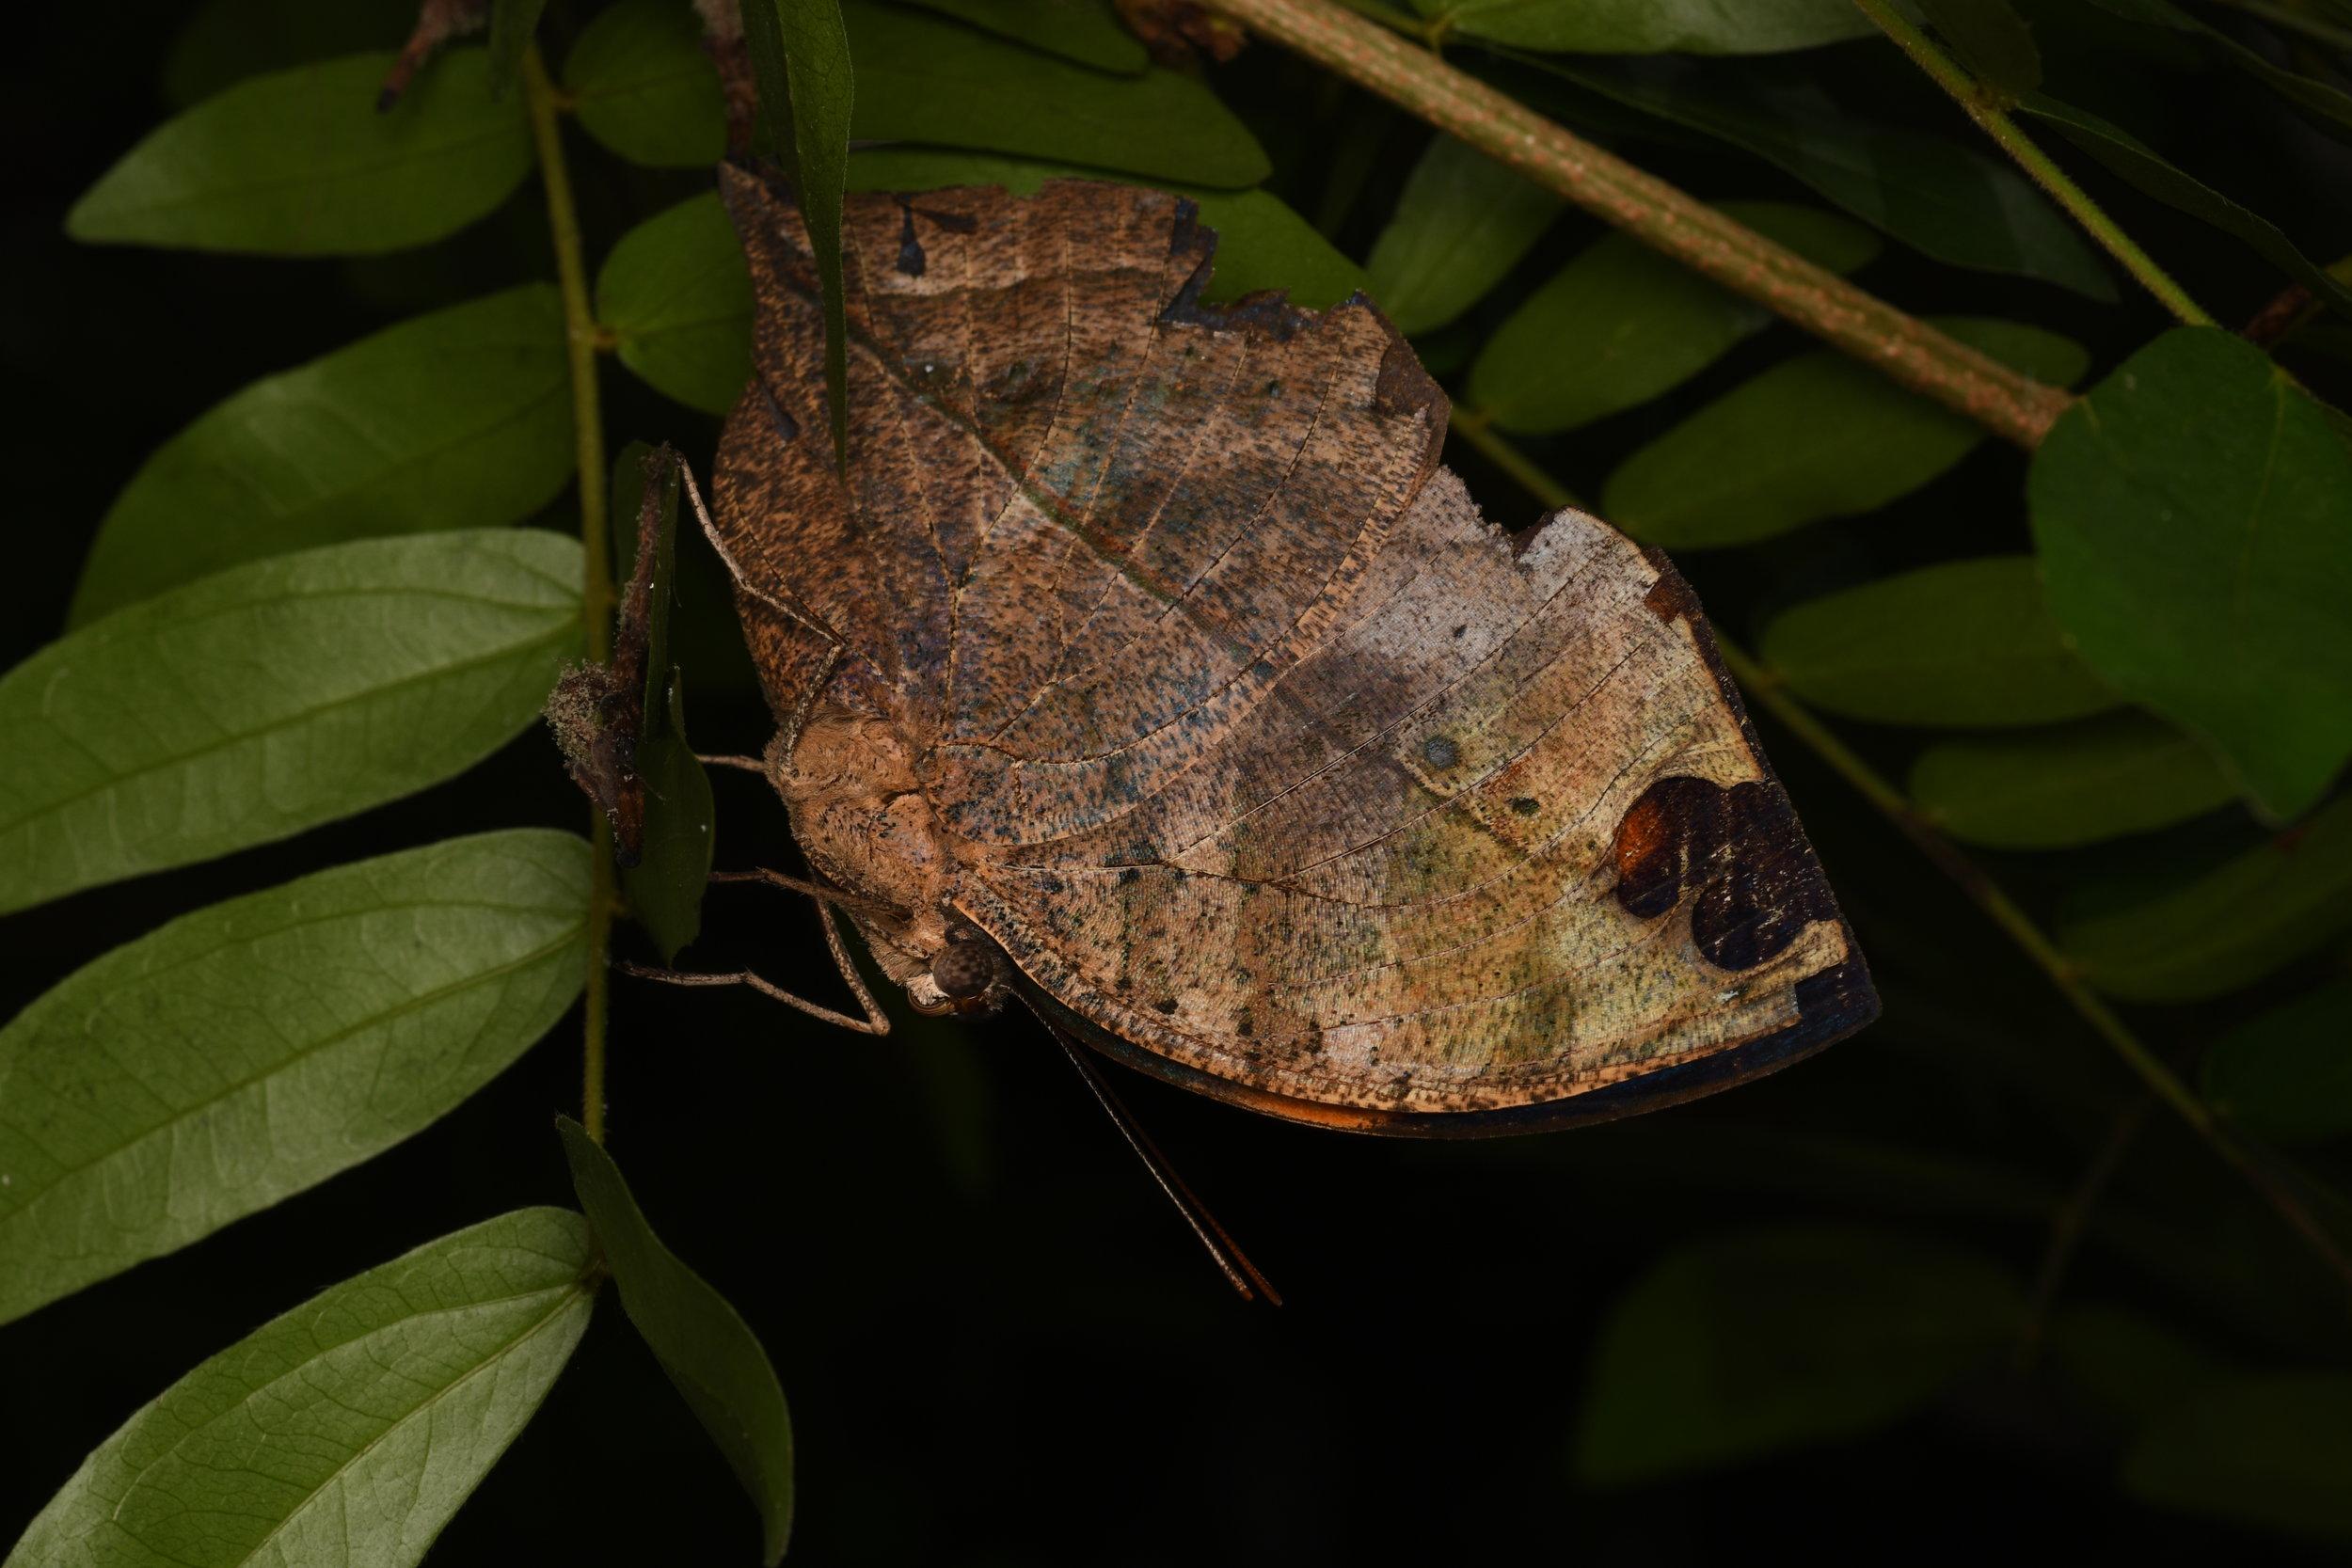 Malayan Oakleaf Butterfly ( Kallima limborgii ),   Penang Island, Malaysia  • Nikon D500, Tokina 100mm f/2,8 macro, Nikon SB900 @ 1/4 power with Alex Goh Macro Diffuser, ISO100, f/18, 1/160s